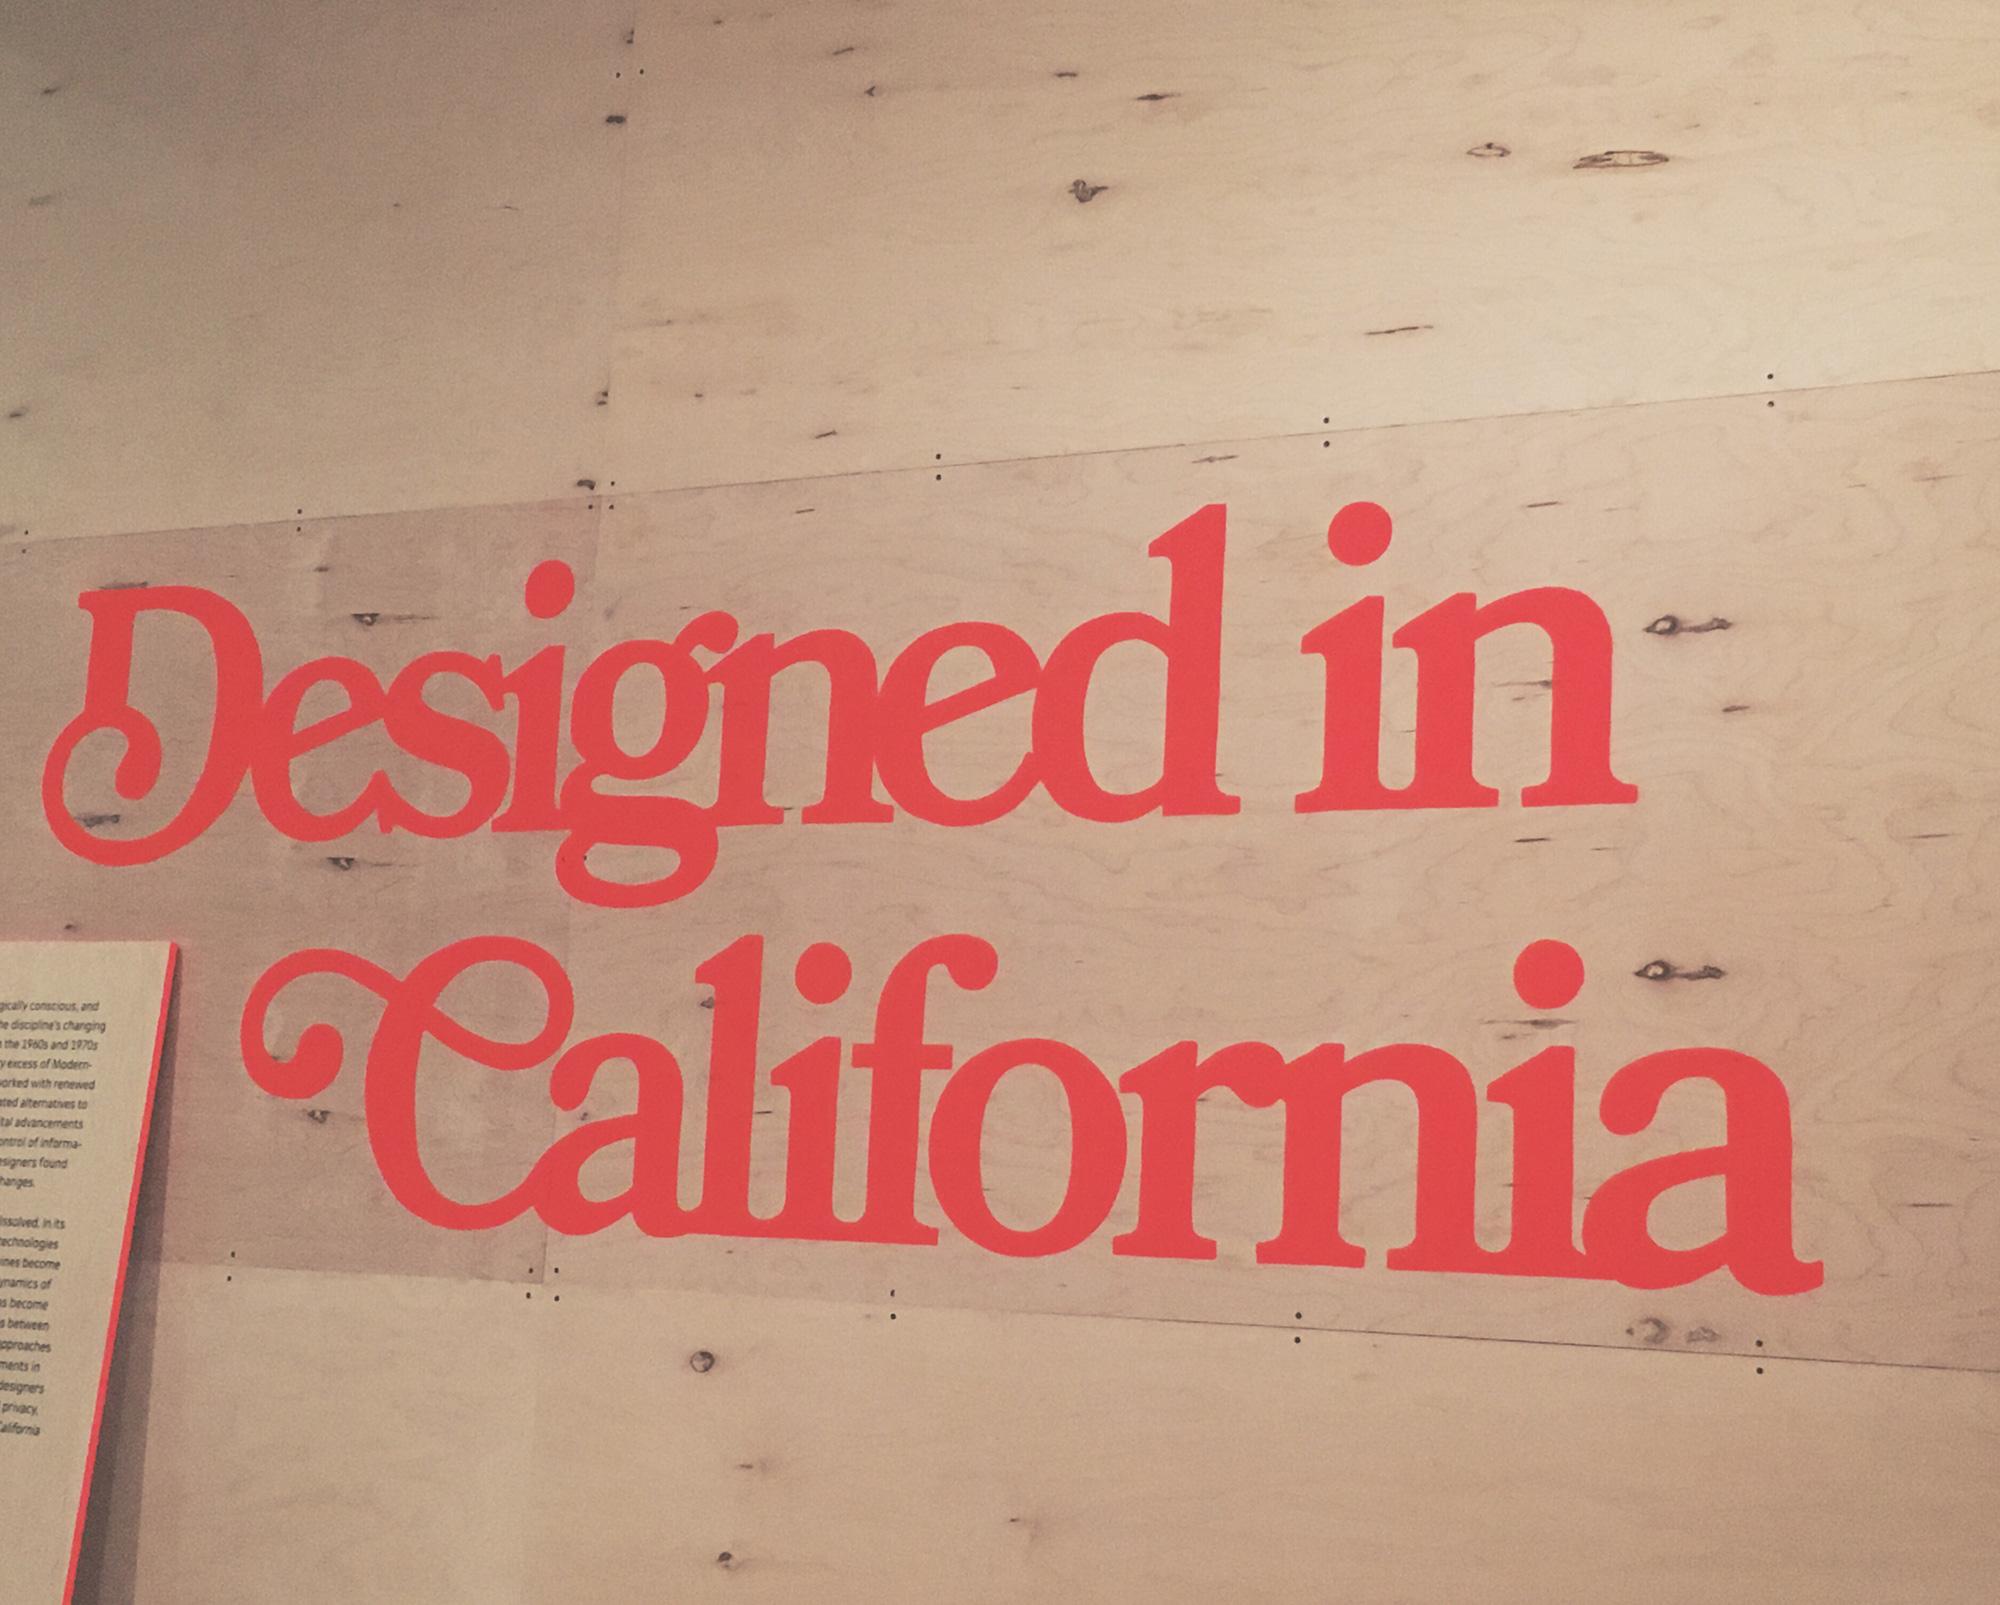 SF MoMA | Designed in California